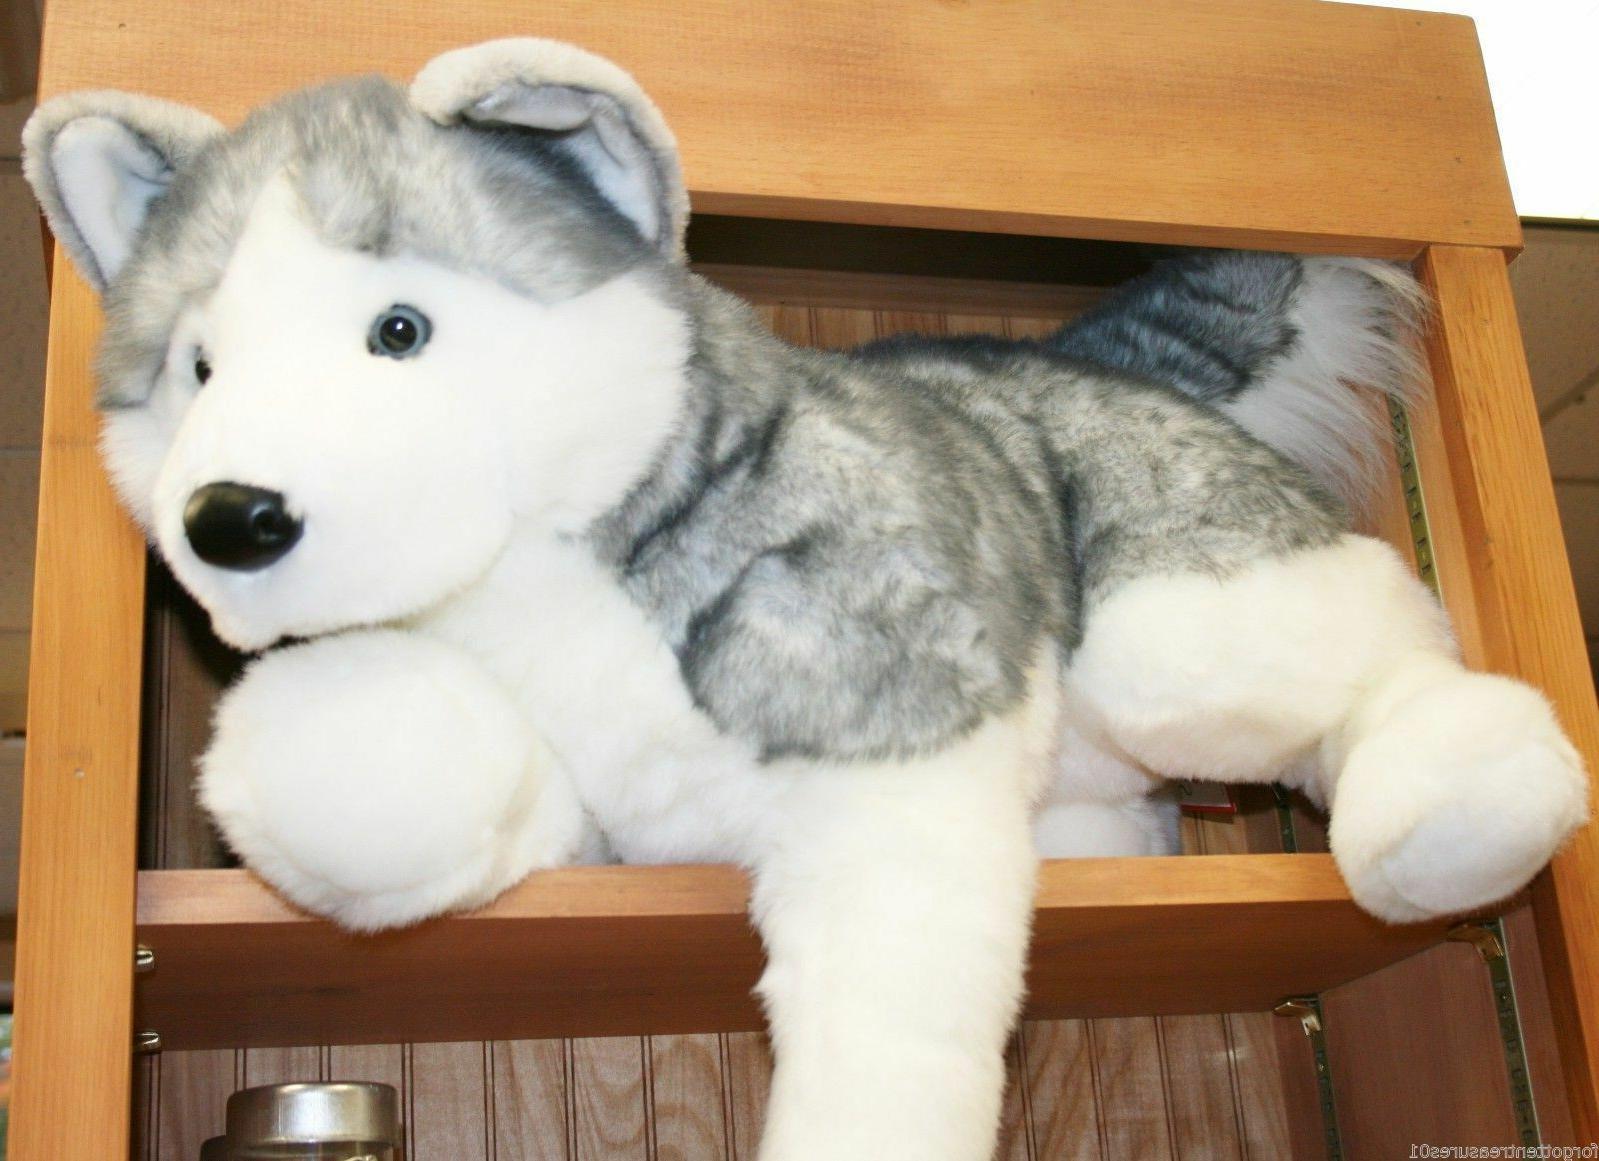 "BARKER plush 30"" LARGE HUSKY stuffed animal DOG by Douglas l"